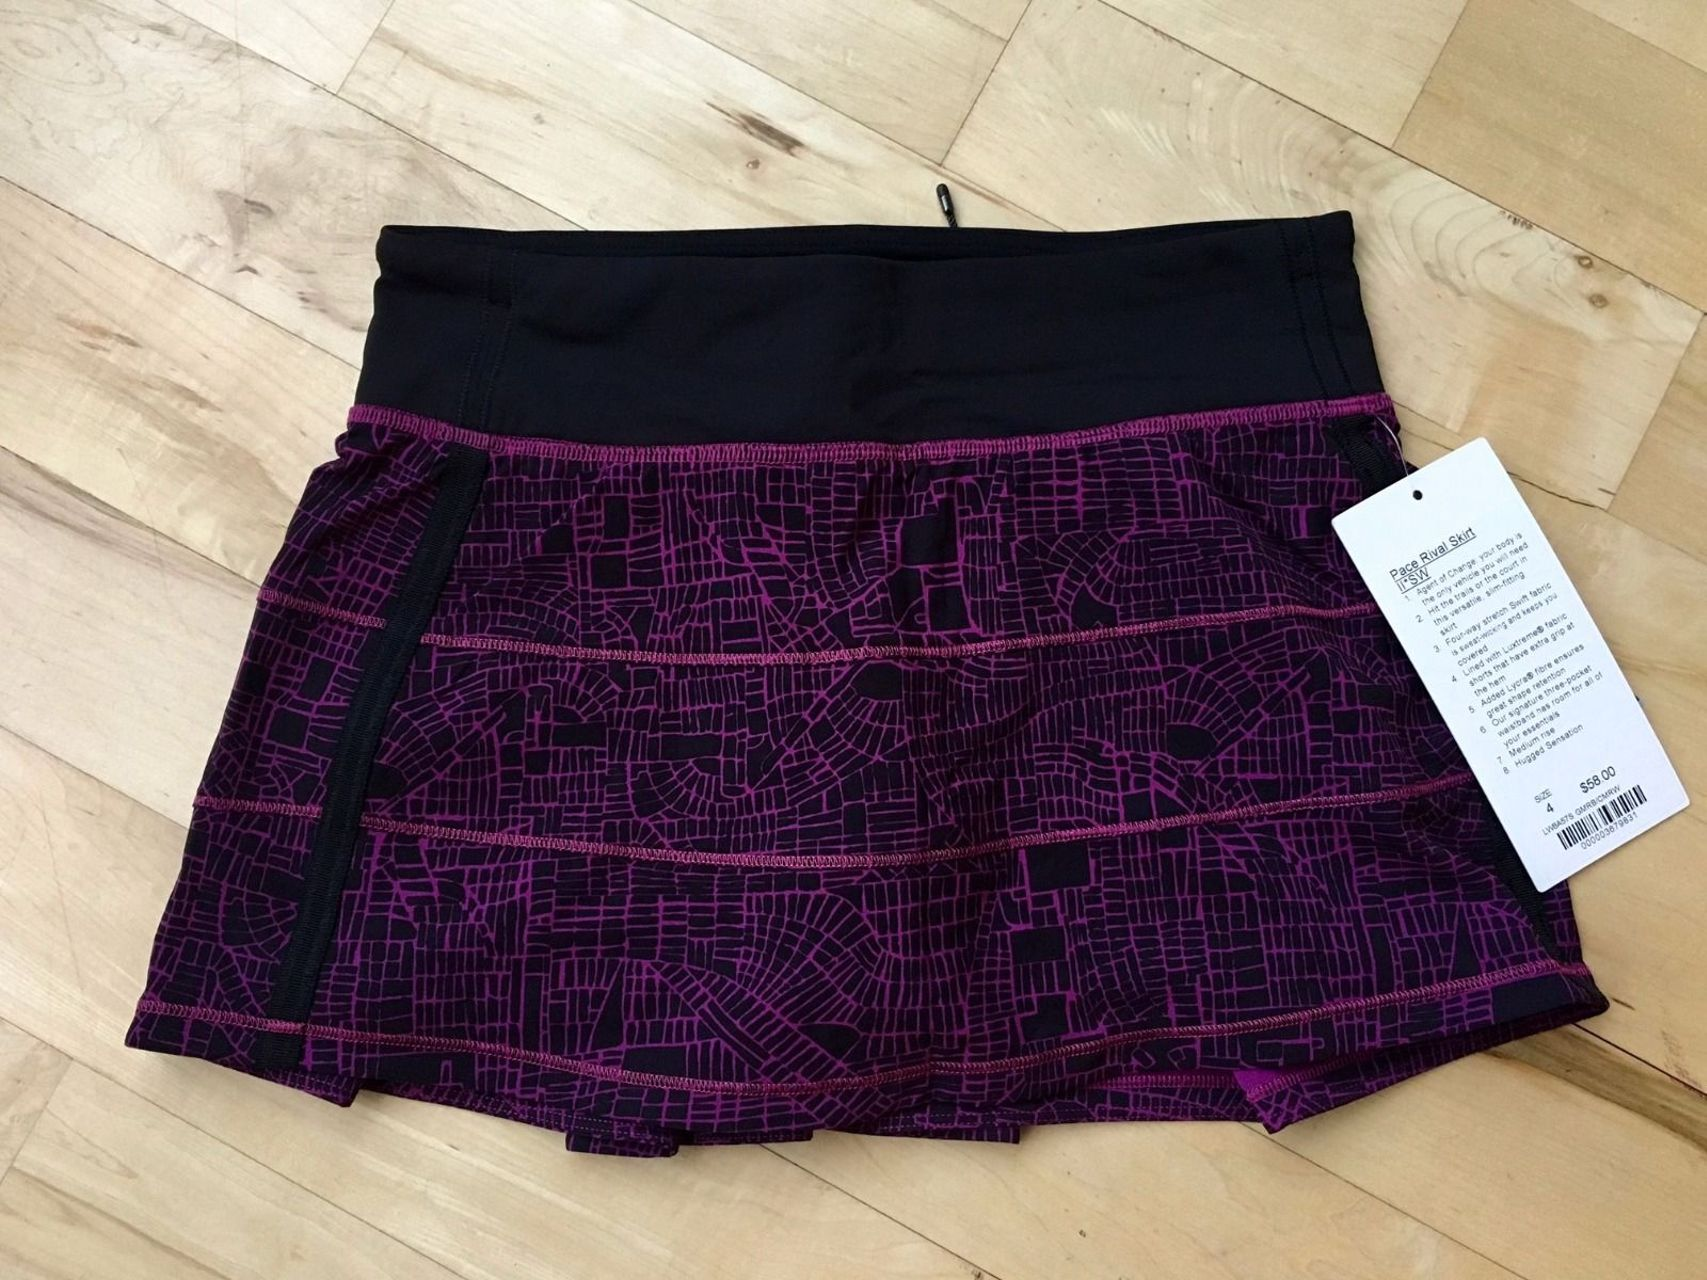 Lululemon Pace Rival Skirt II (Regular) - 2016 Seawheeze - Grid Map Regal Plum Black / Coded Manifesto Regal Plum White